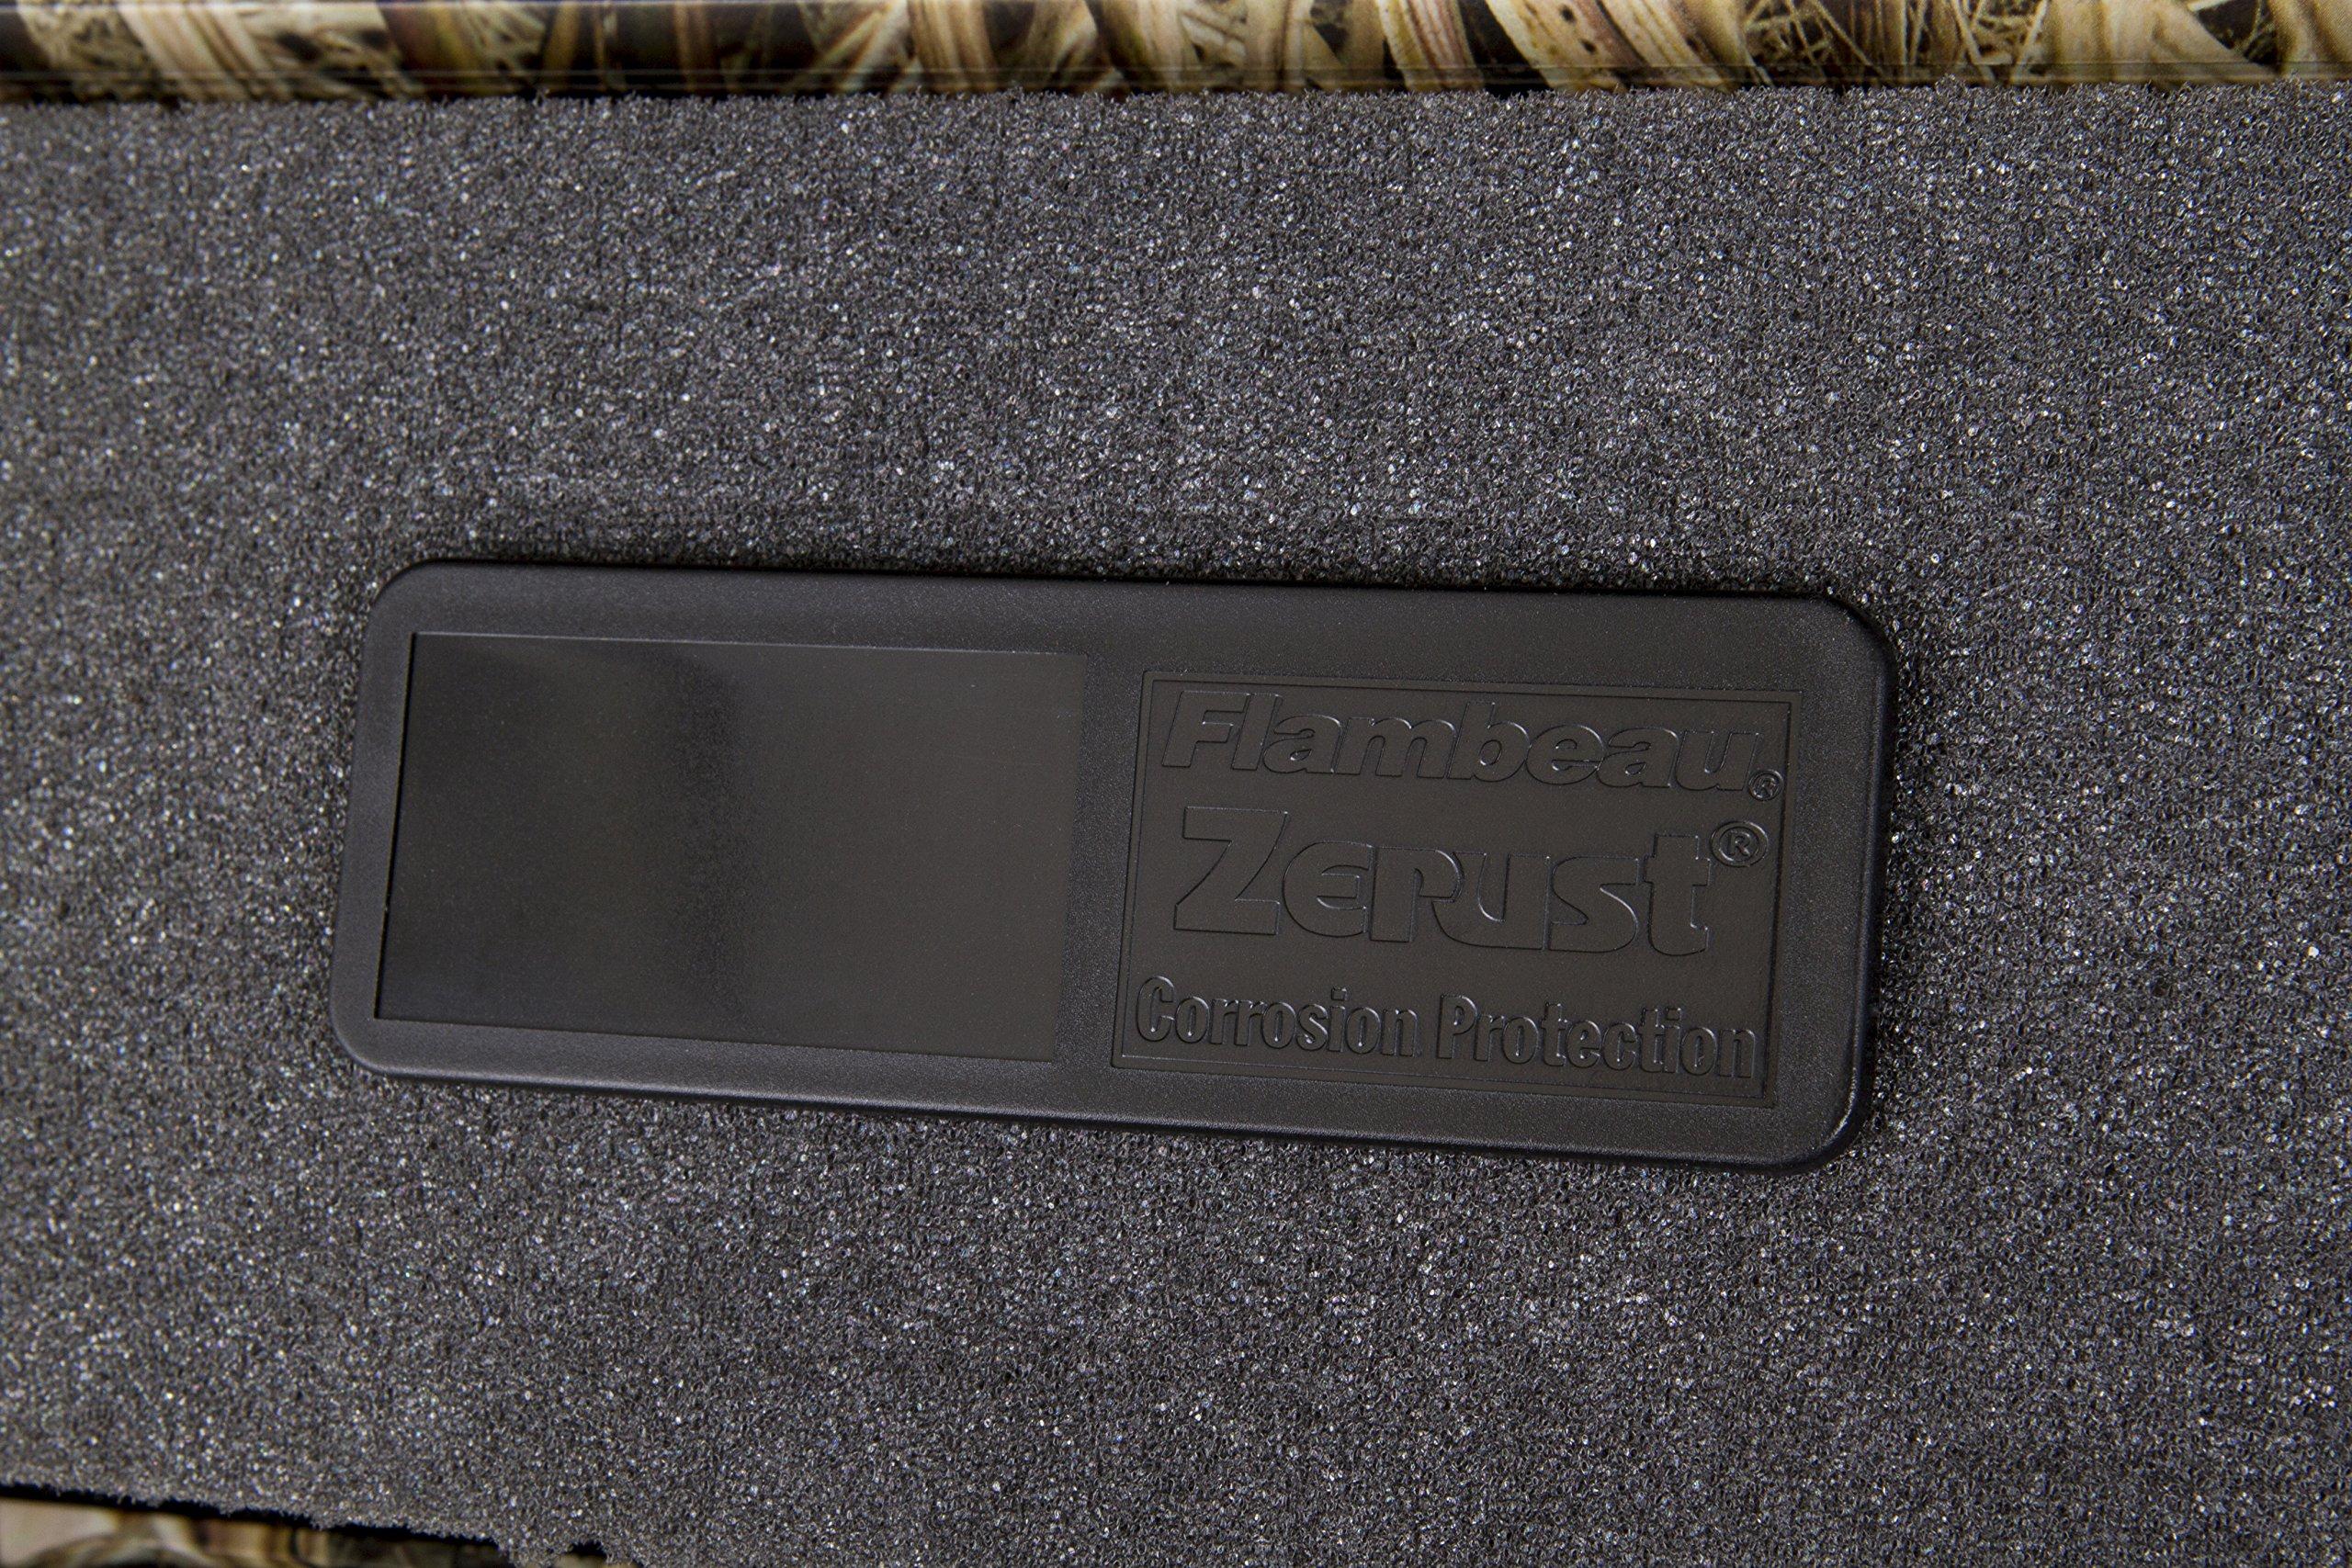 Flambeau Outdoors HD Series Gun Case, X-Large by Flambeau Outdoors (Image #1)